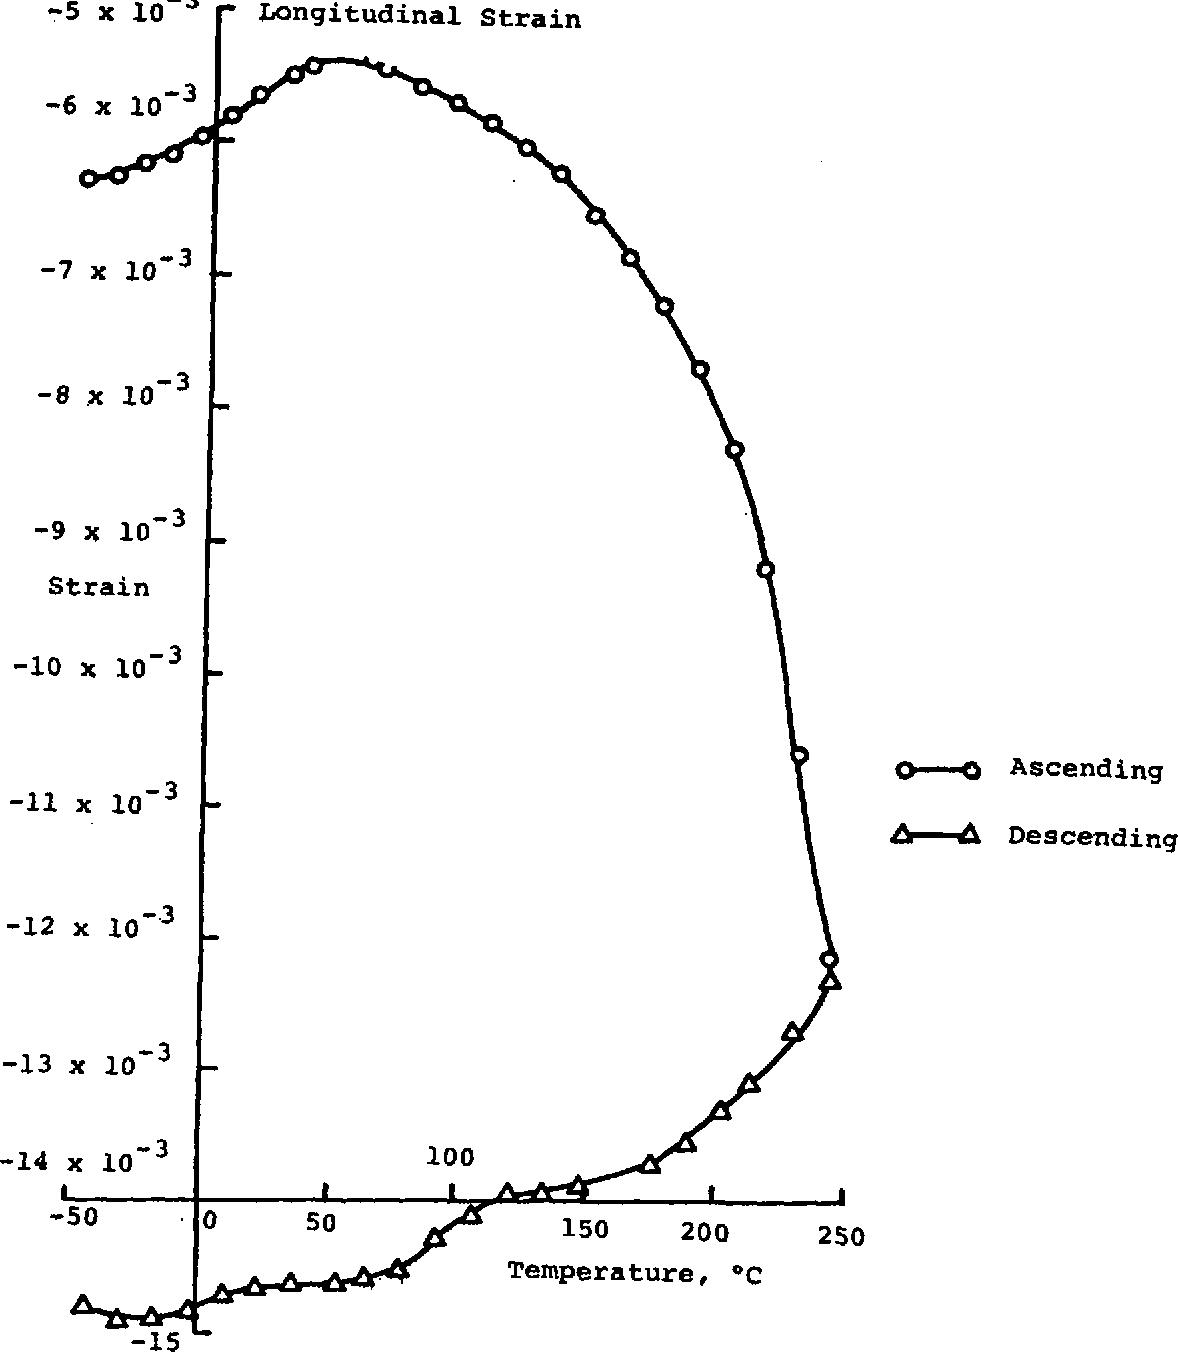 Figure 7. Longitudinal Strain versus Temperature Load = -2946 I+ (-300 kg) Ooll = -70.74 MPa